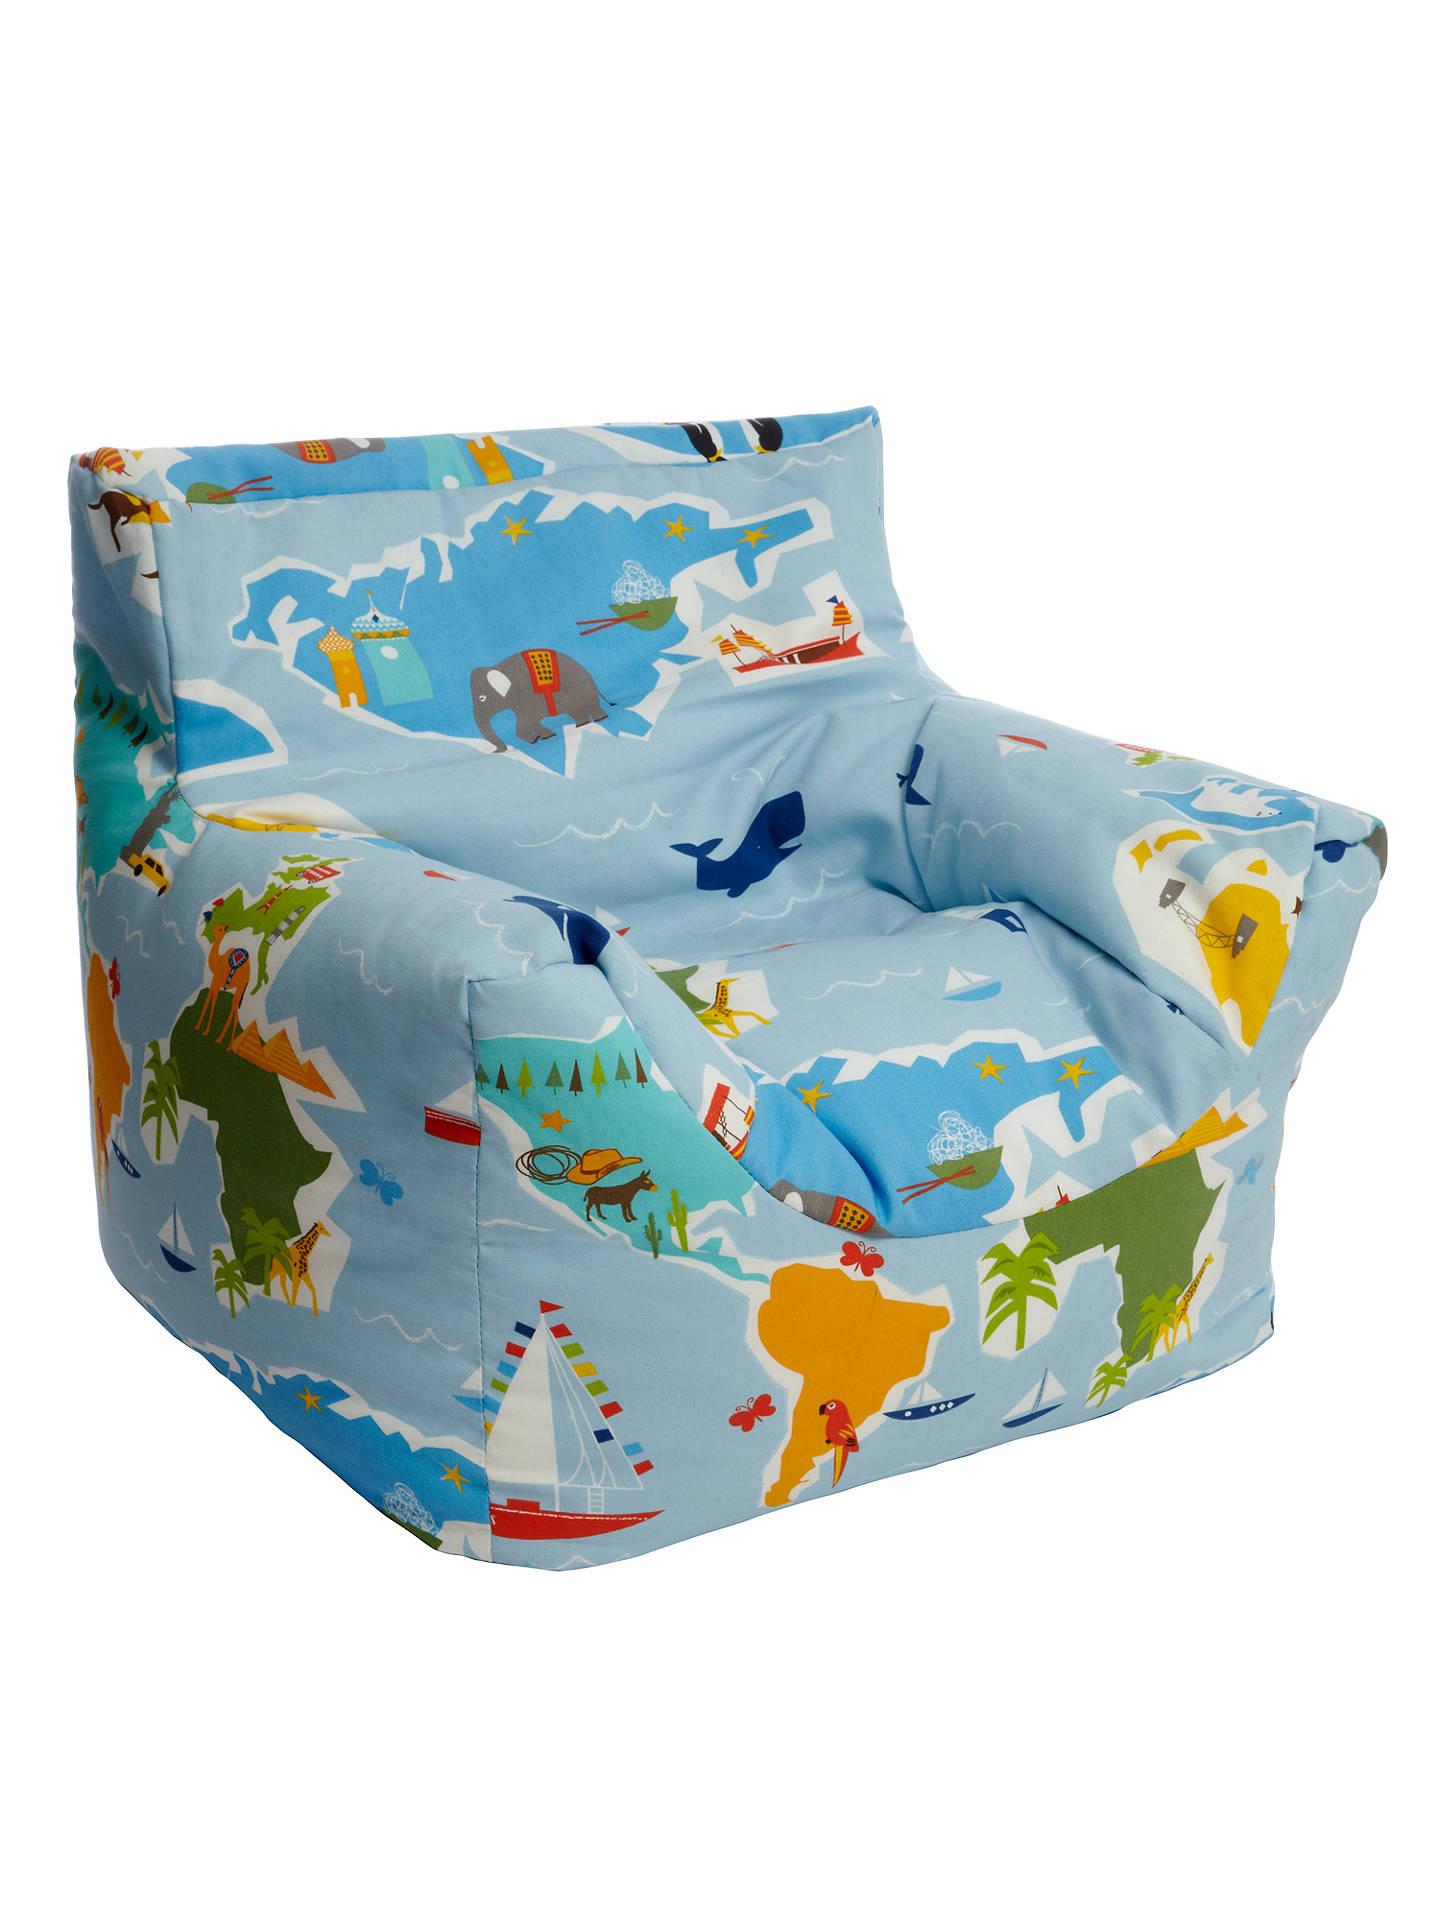 Little Home At John Lewis Globetrotter Bean Bag Chair At